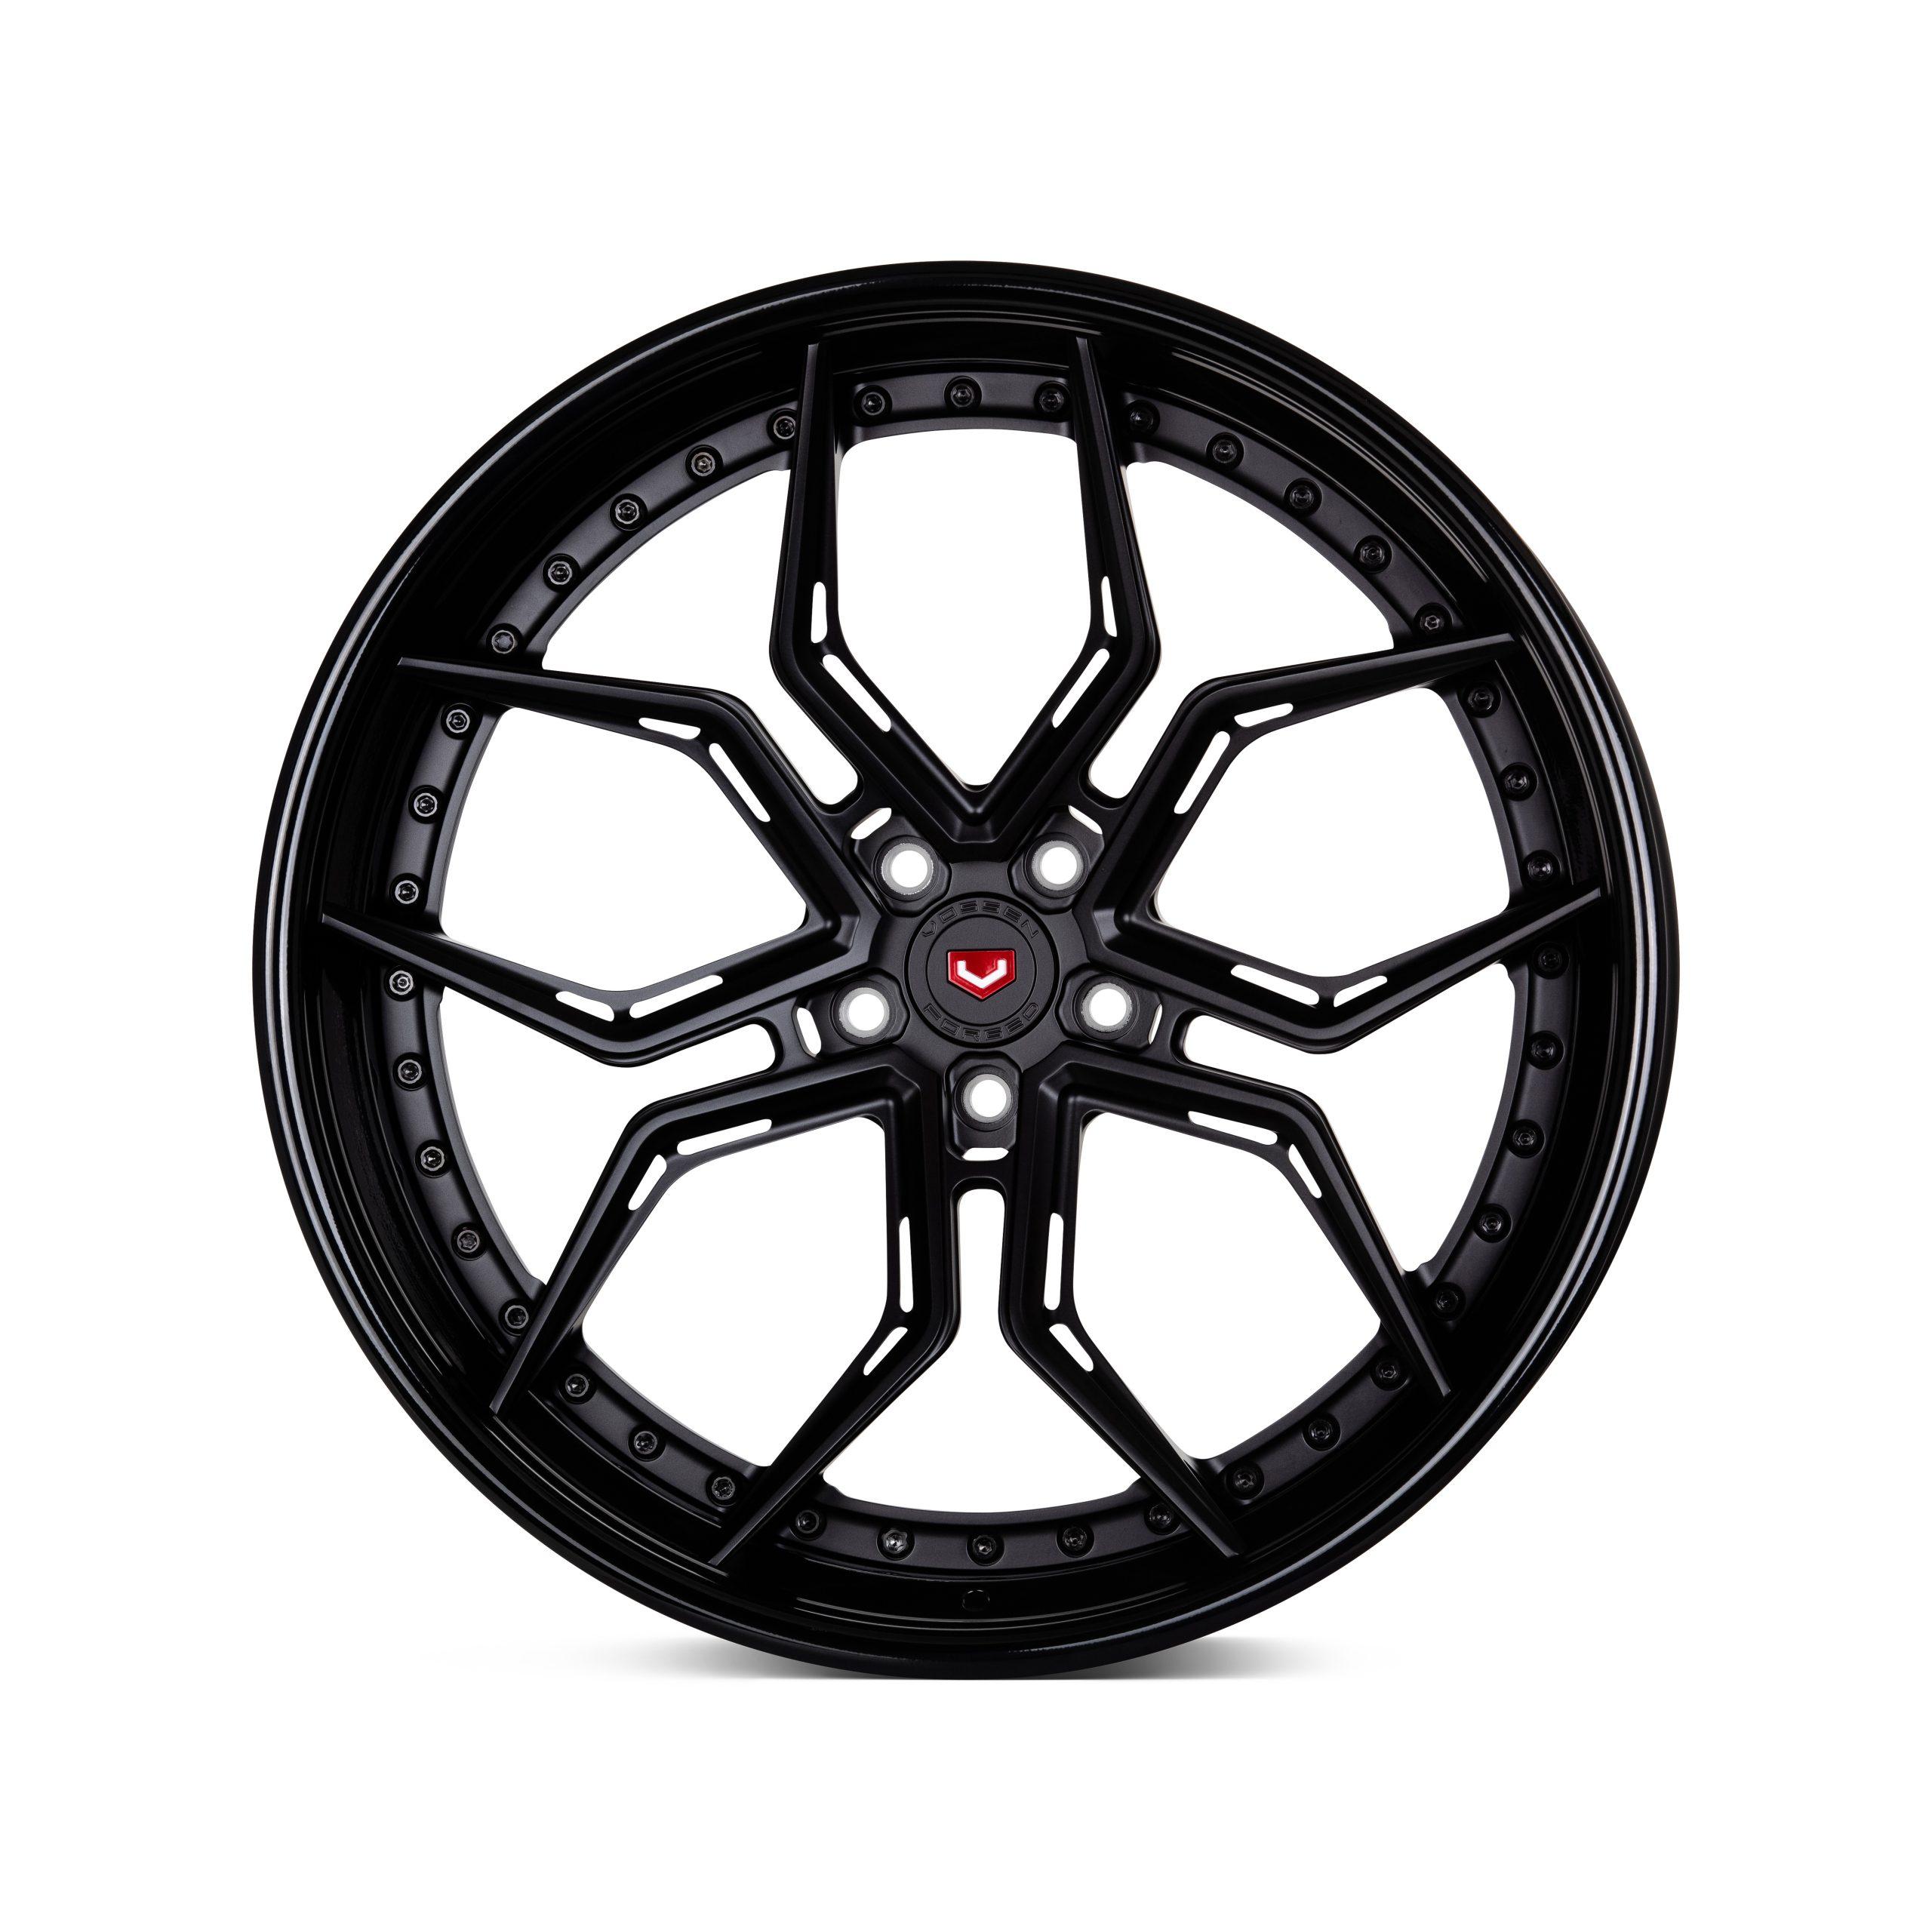 EVO-3R wheel